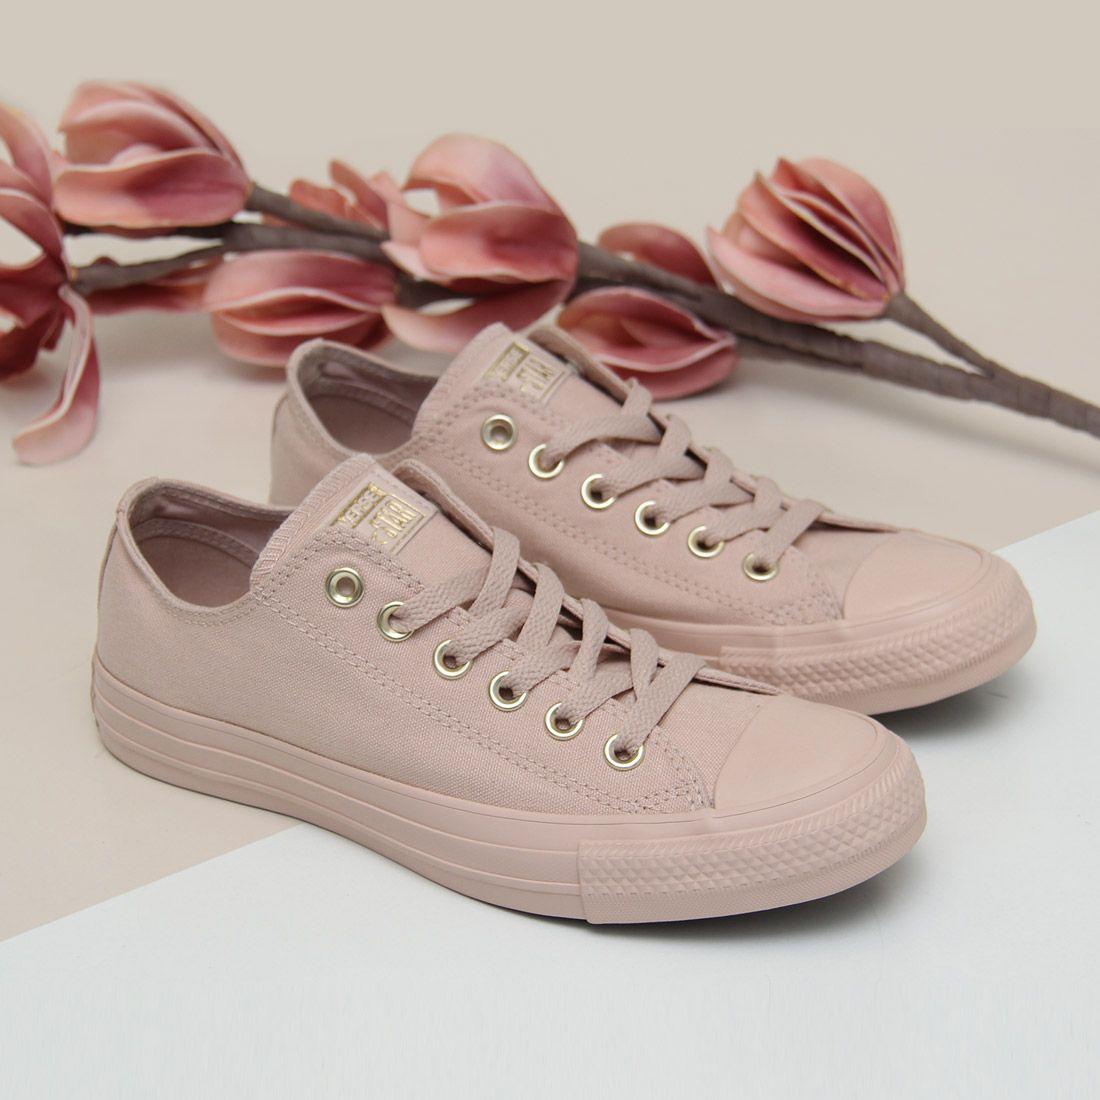 Fangoso Andes cayó  CONVERSE CHUCK TAYLOR ALL STAR | Zapatos converse de mujer, Zapatos tenis  para mujer, Zapatillas converse